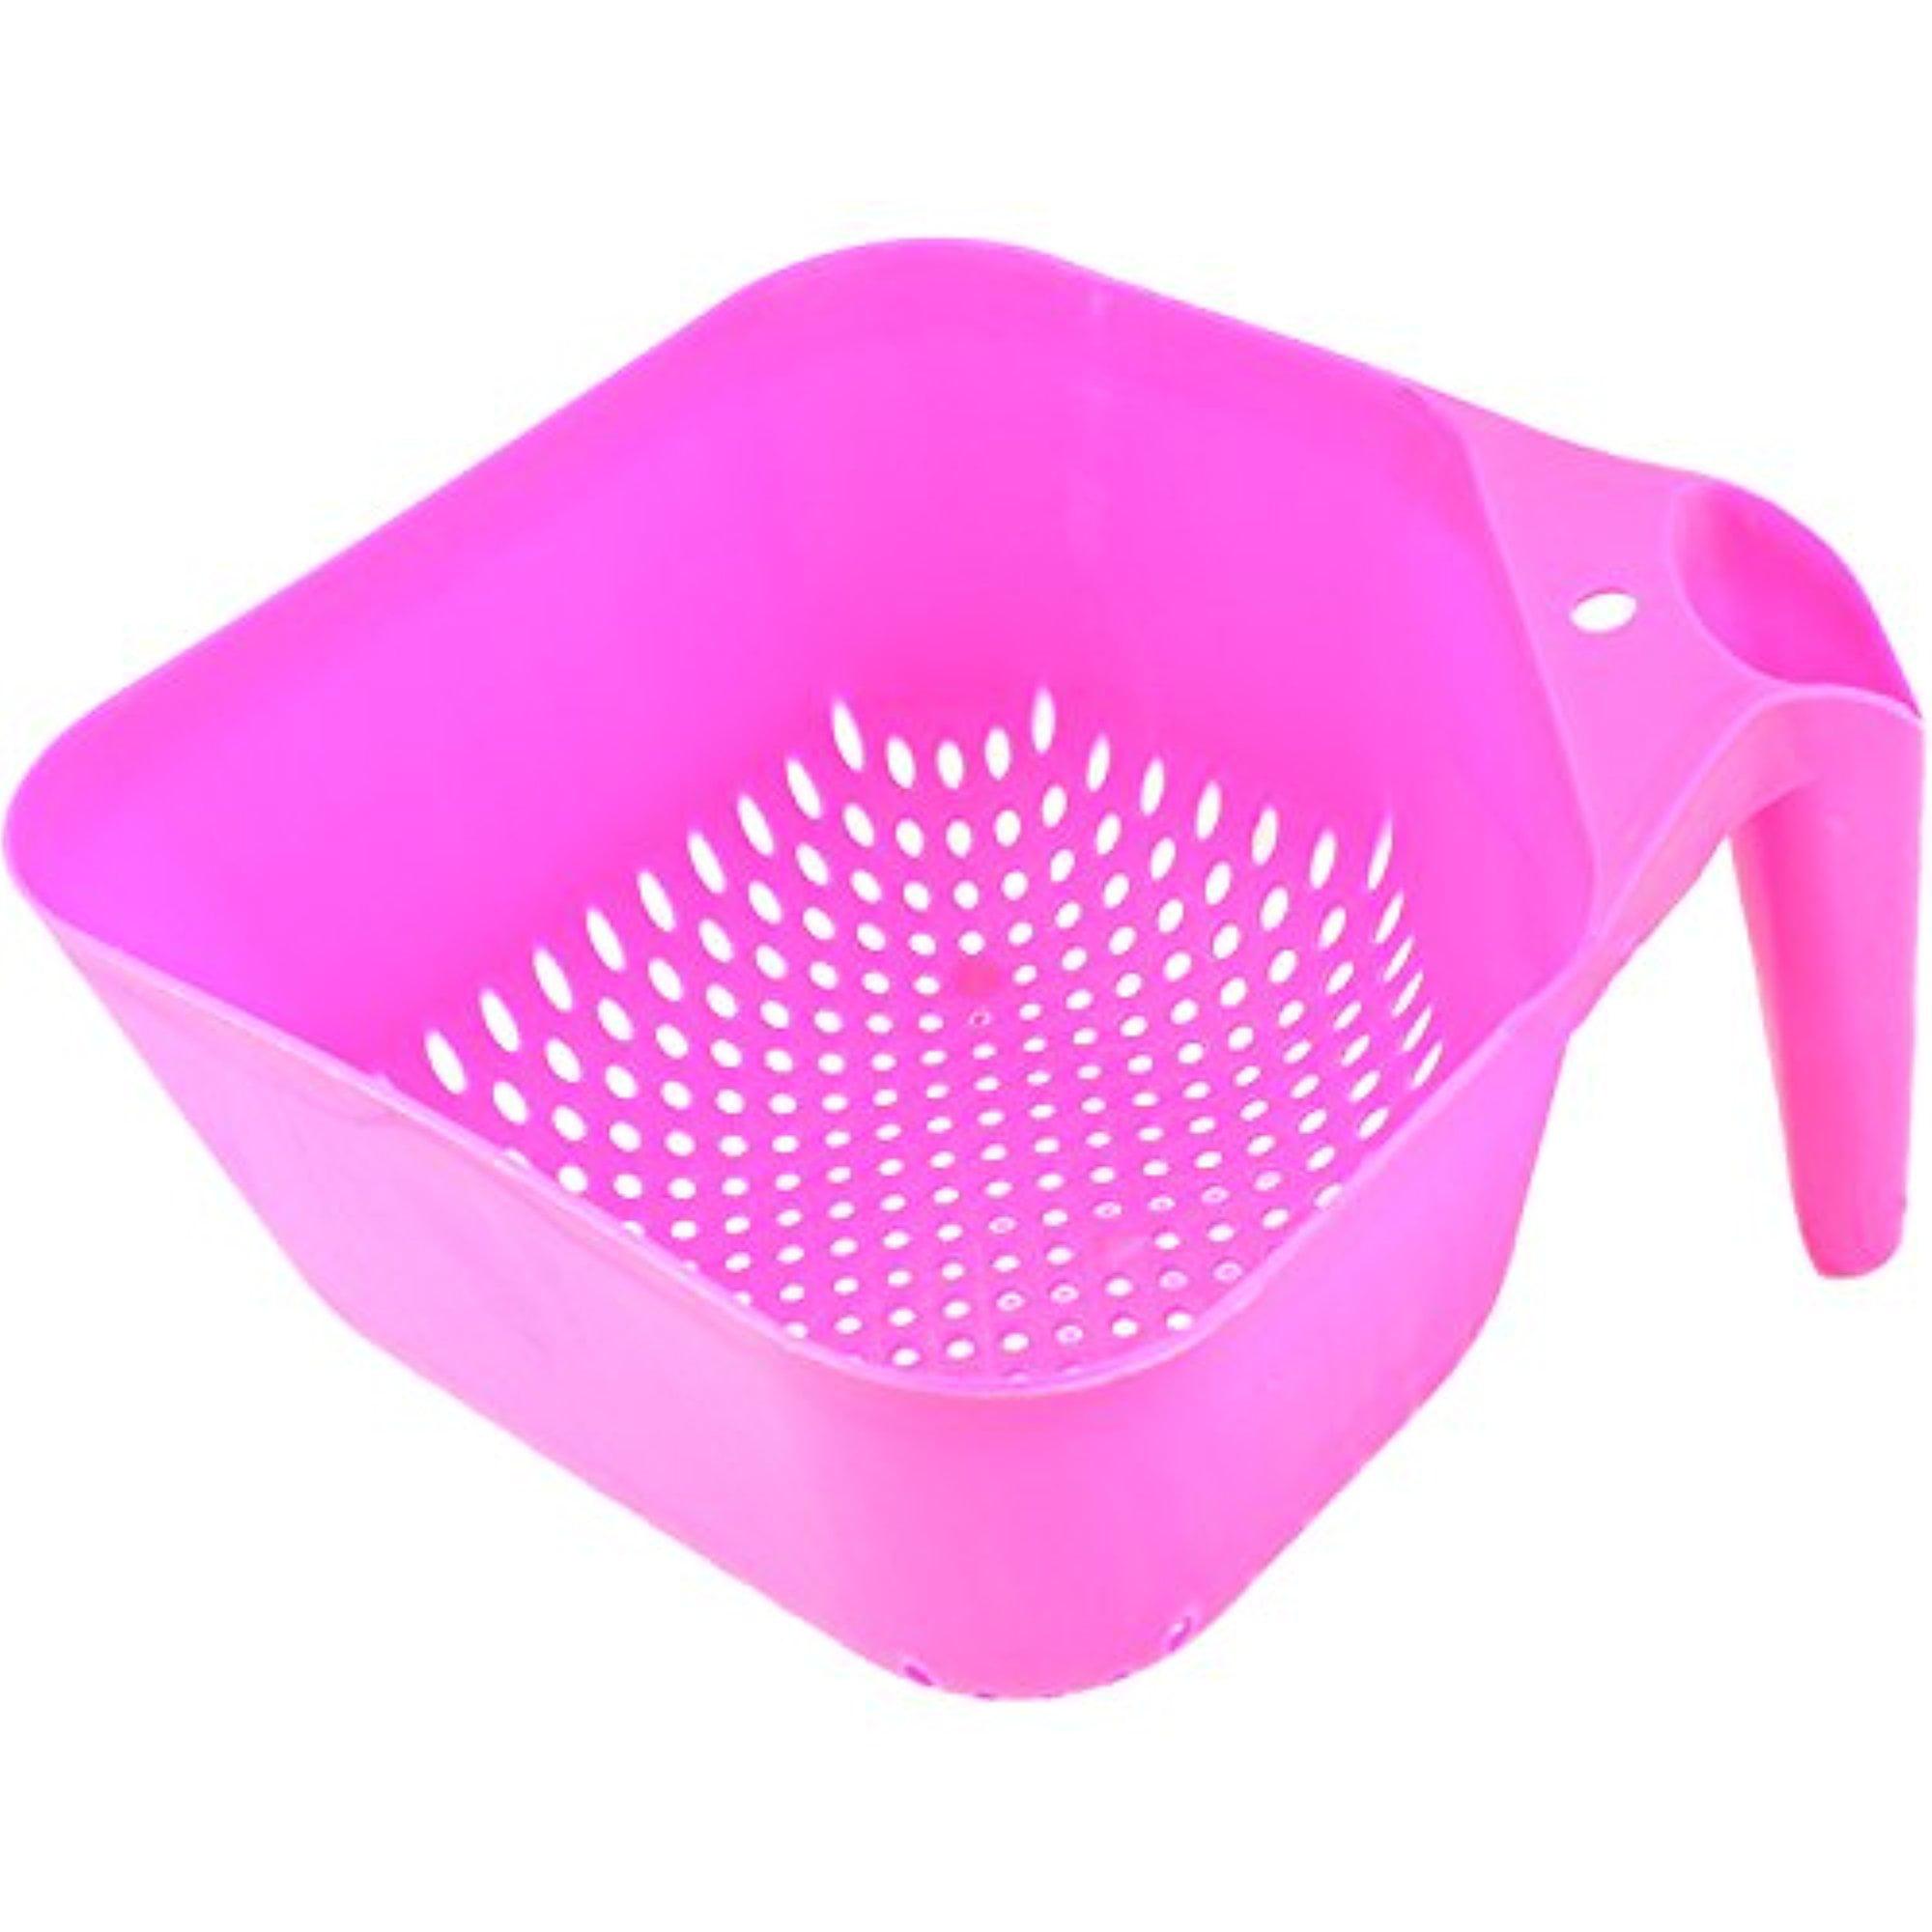 Square Kitchen Colander Strainer with Handle BPA-Free by bogo Brands (Pink)